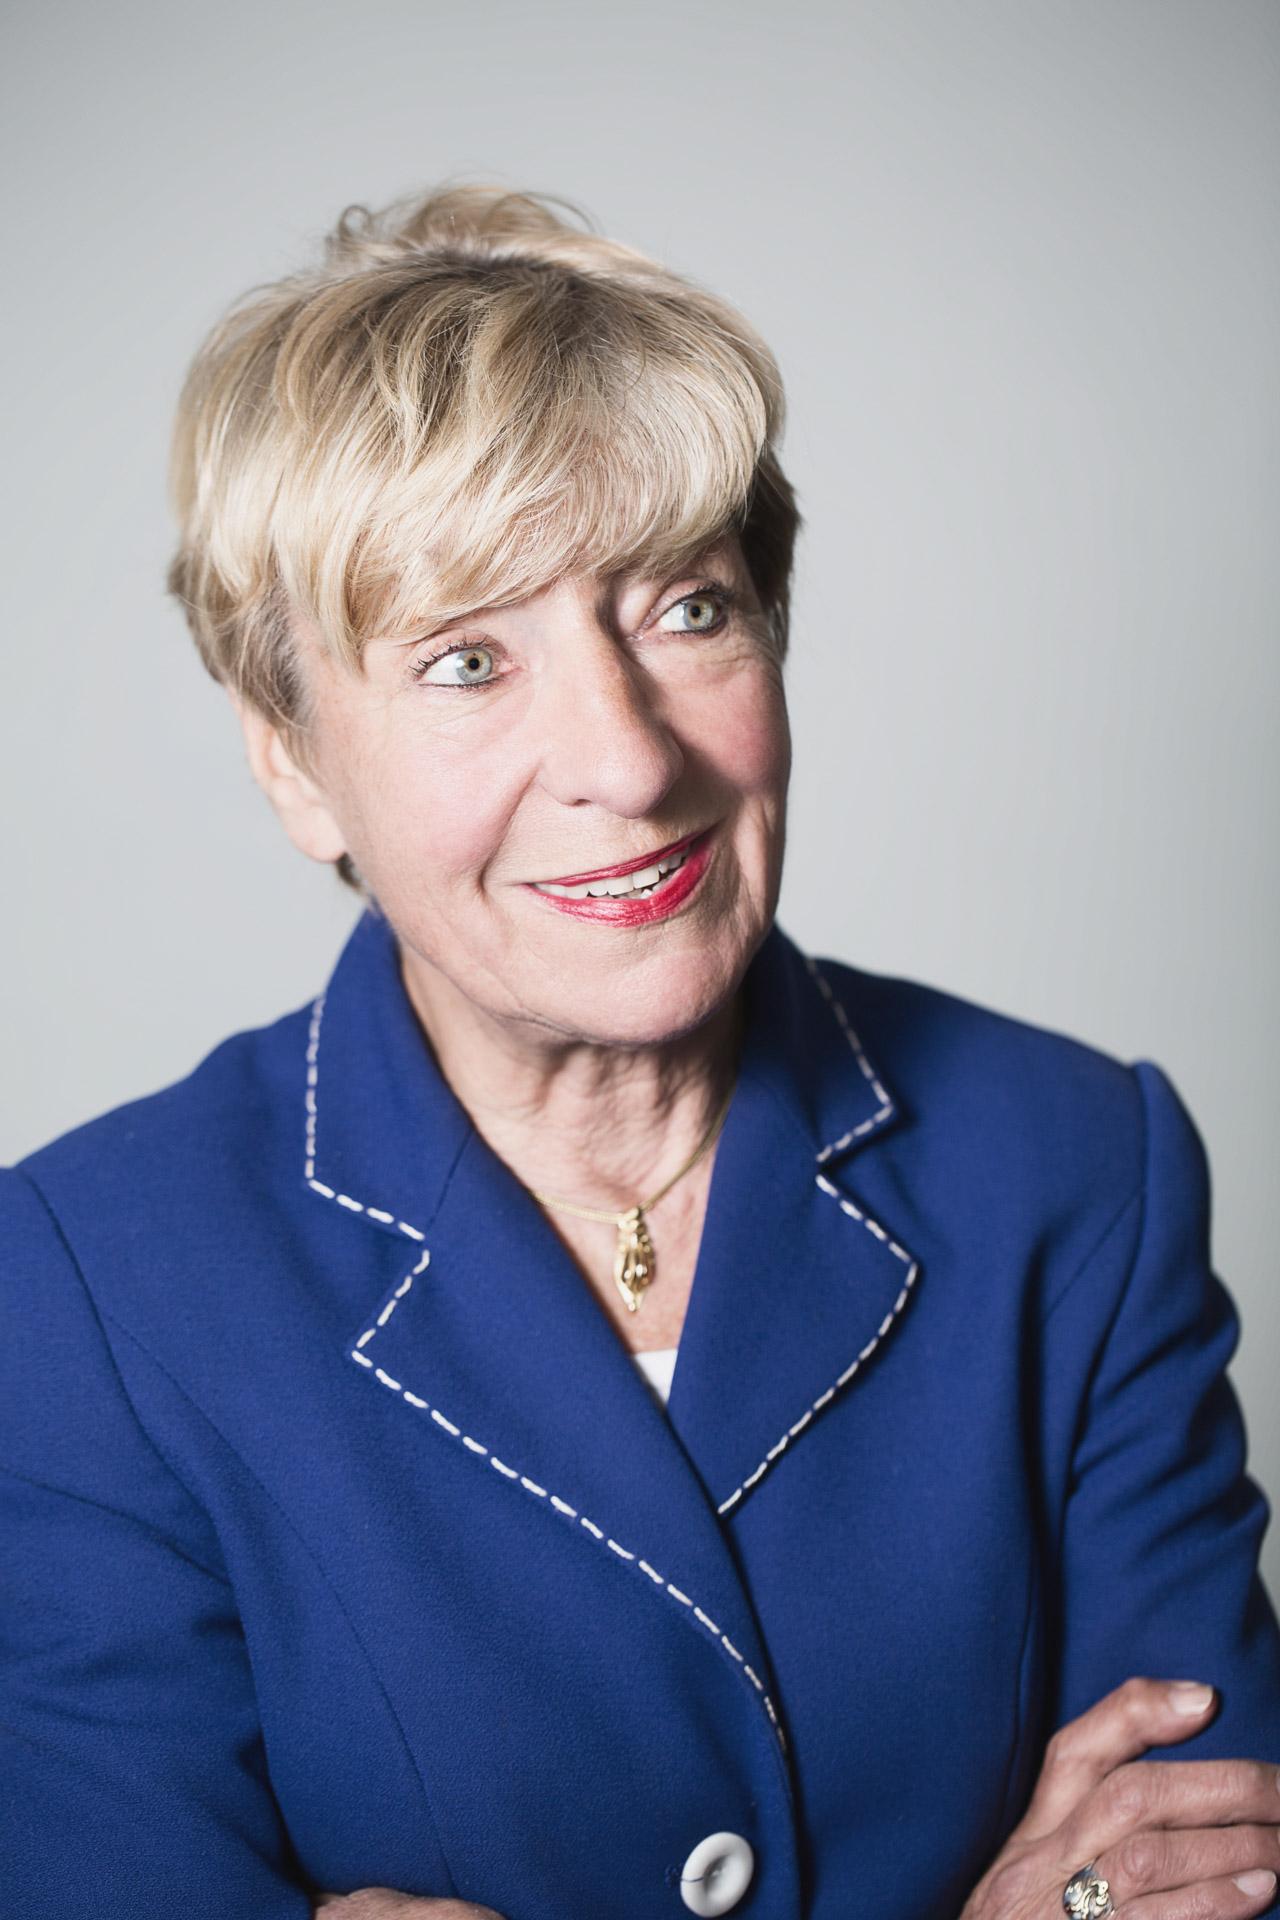 Heidi Hetzer